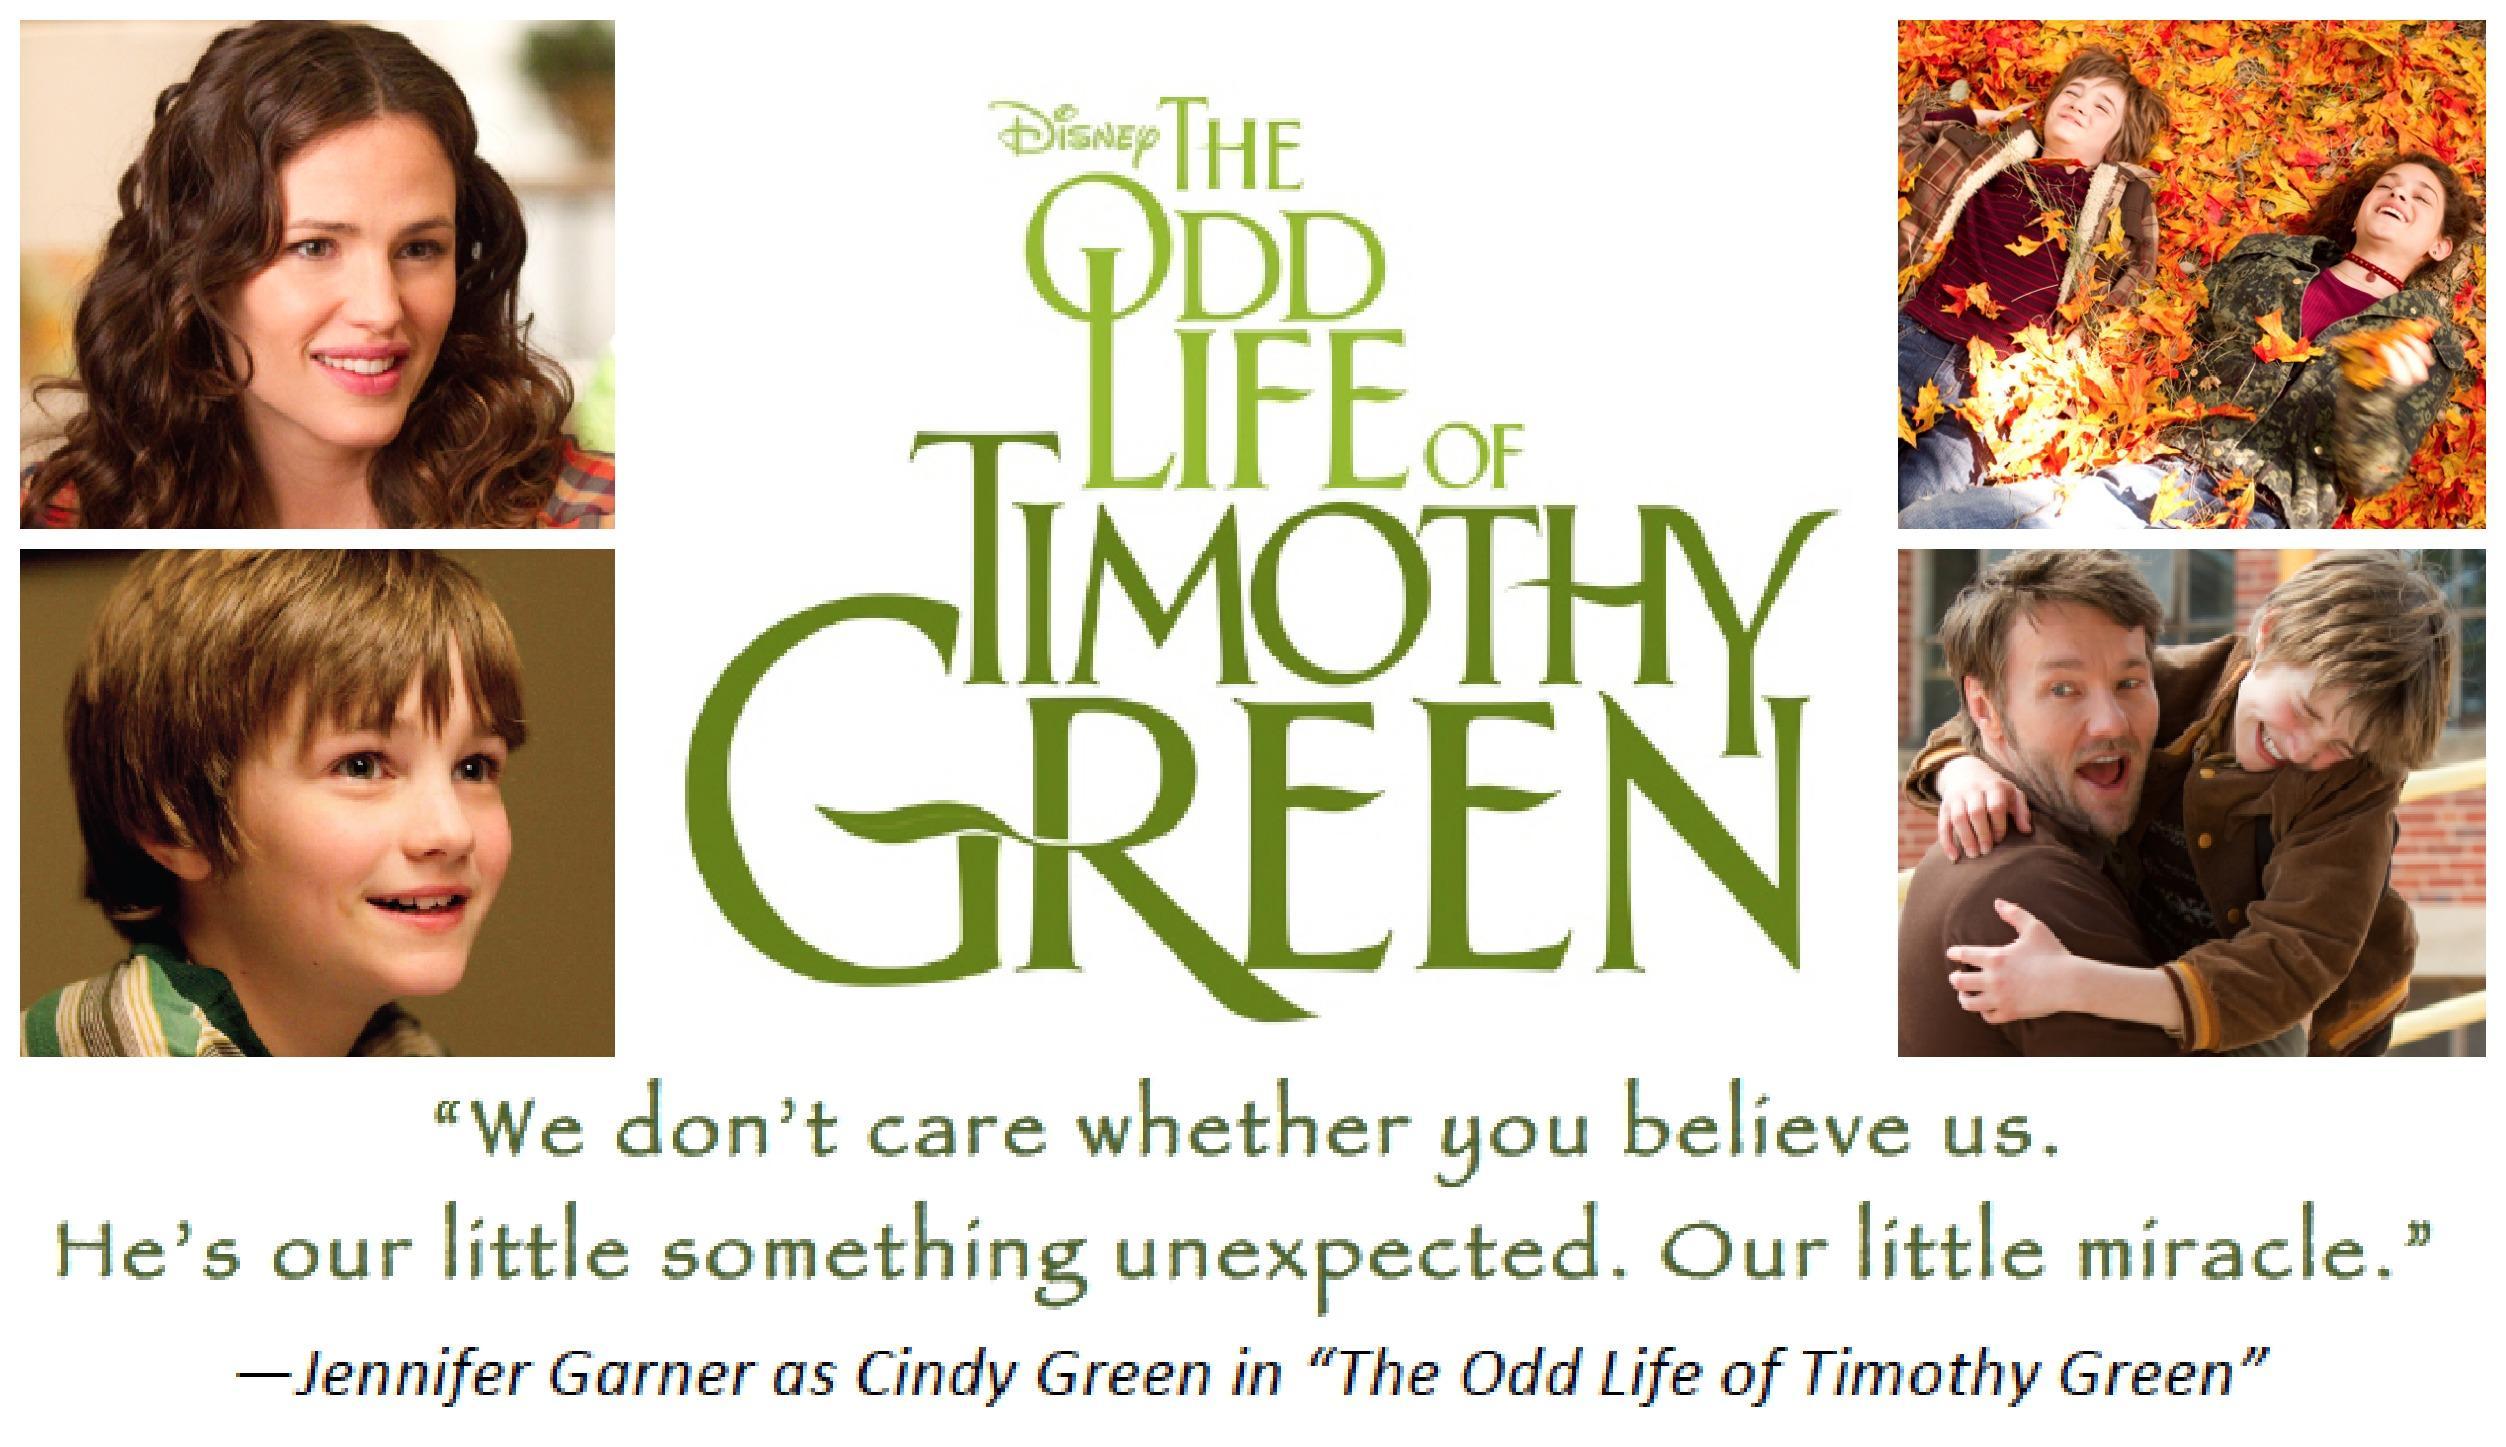 geoff zanelli the odd life of timothy green